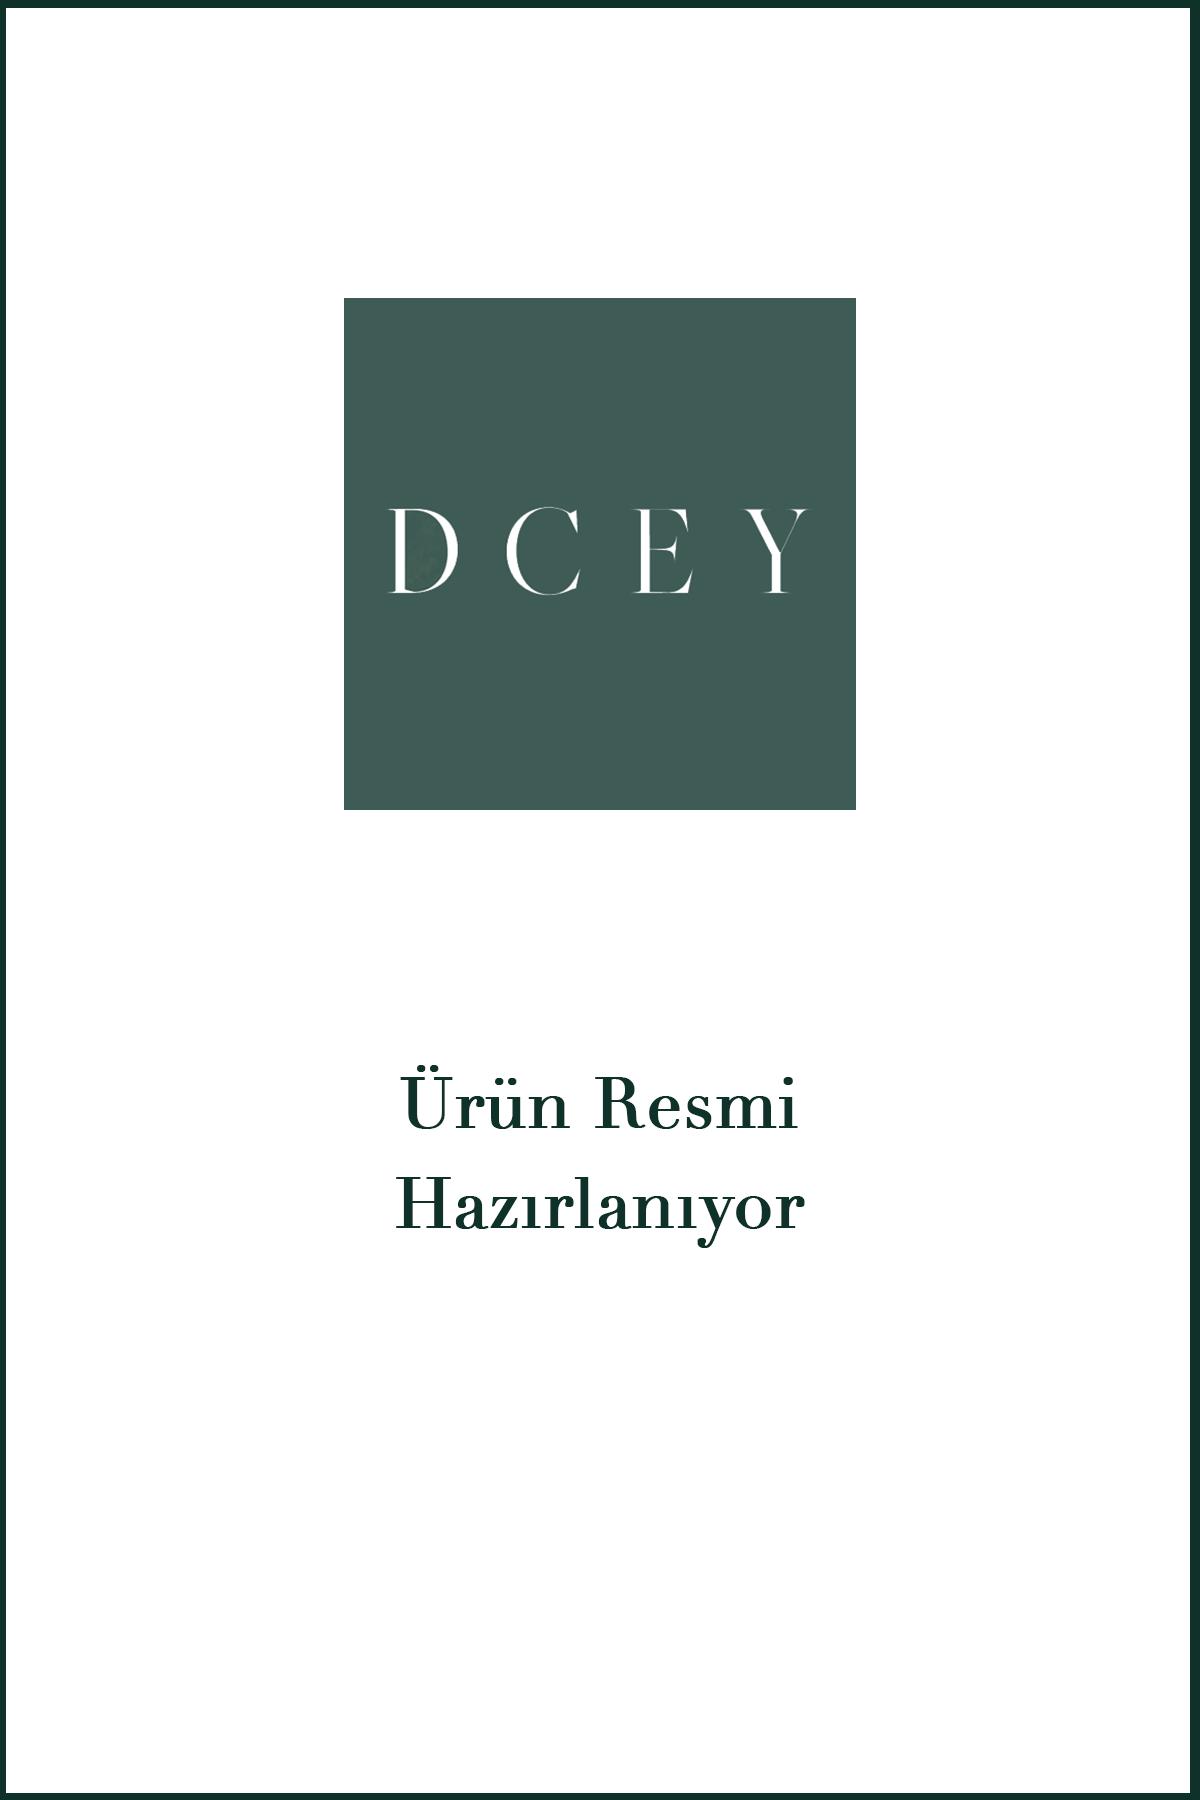 Ella incili ve Kristal saç aksesuarı